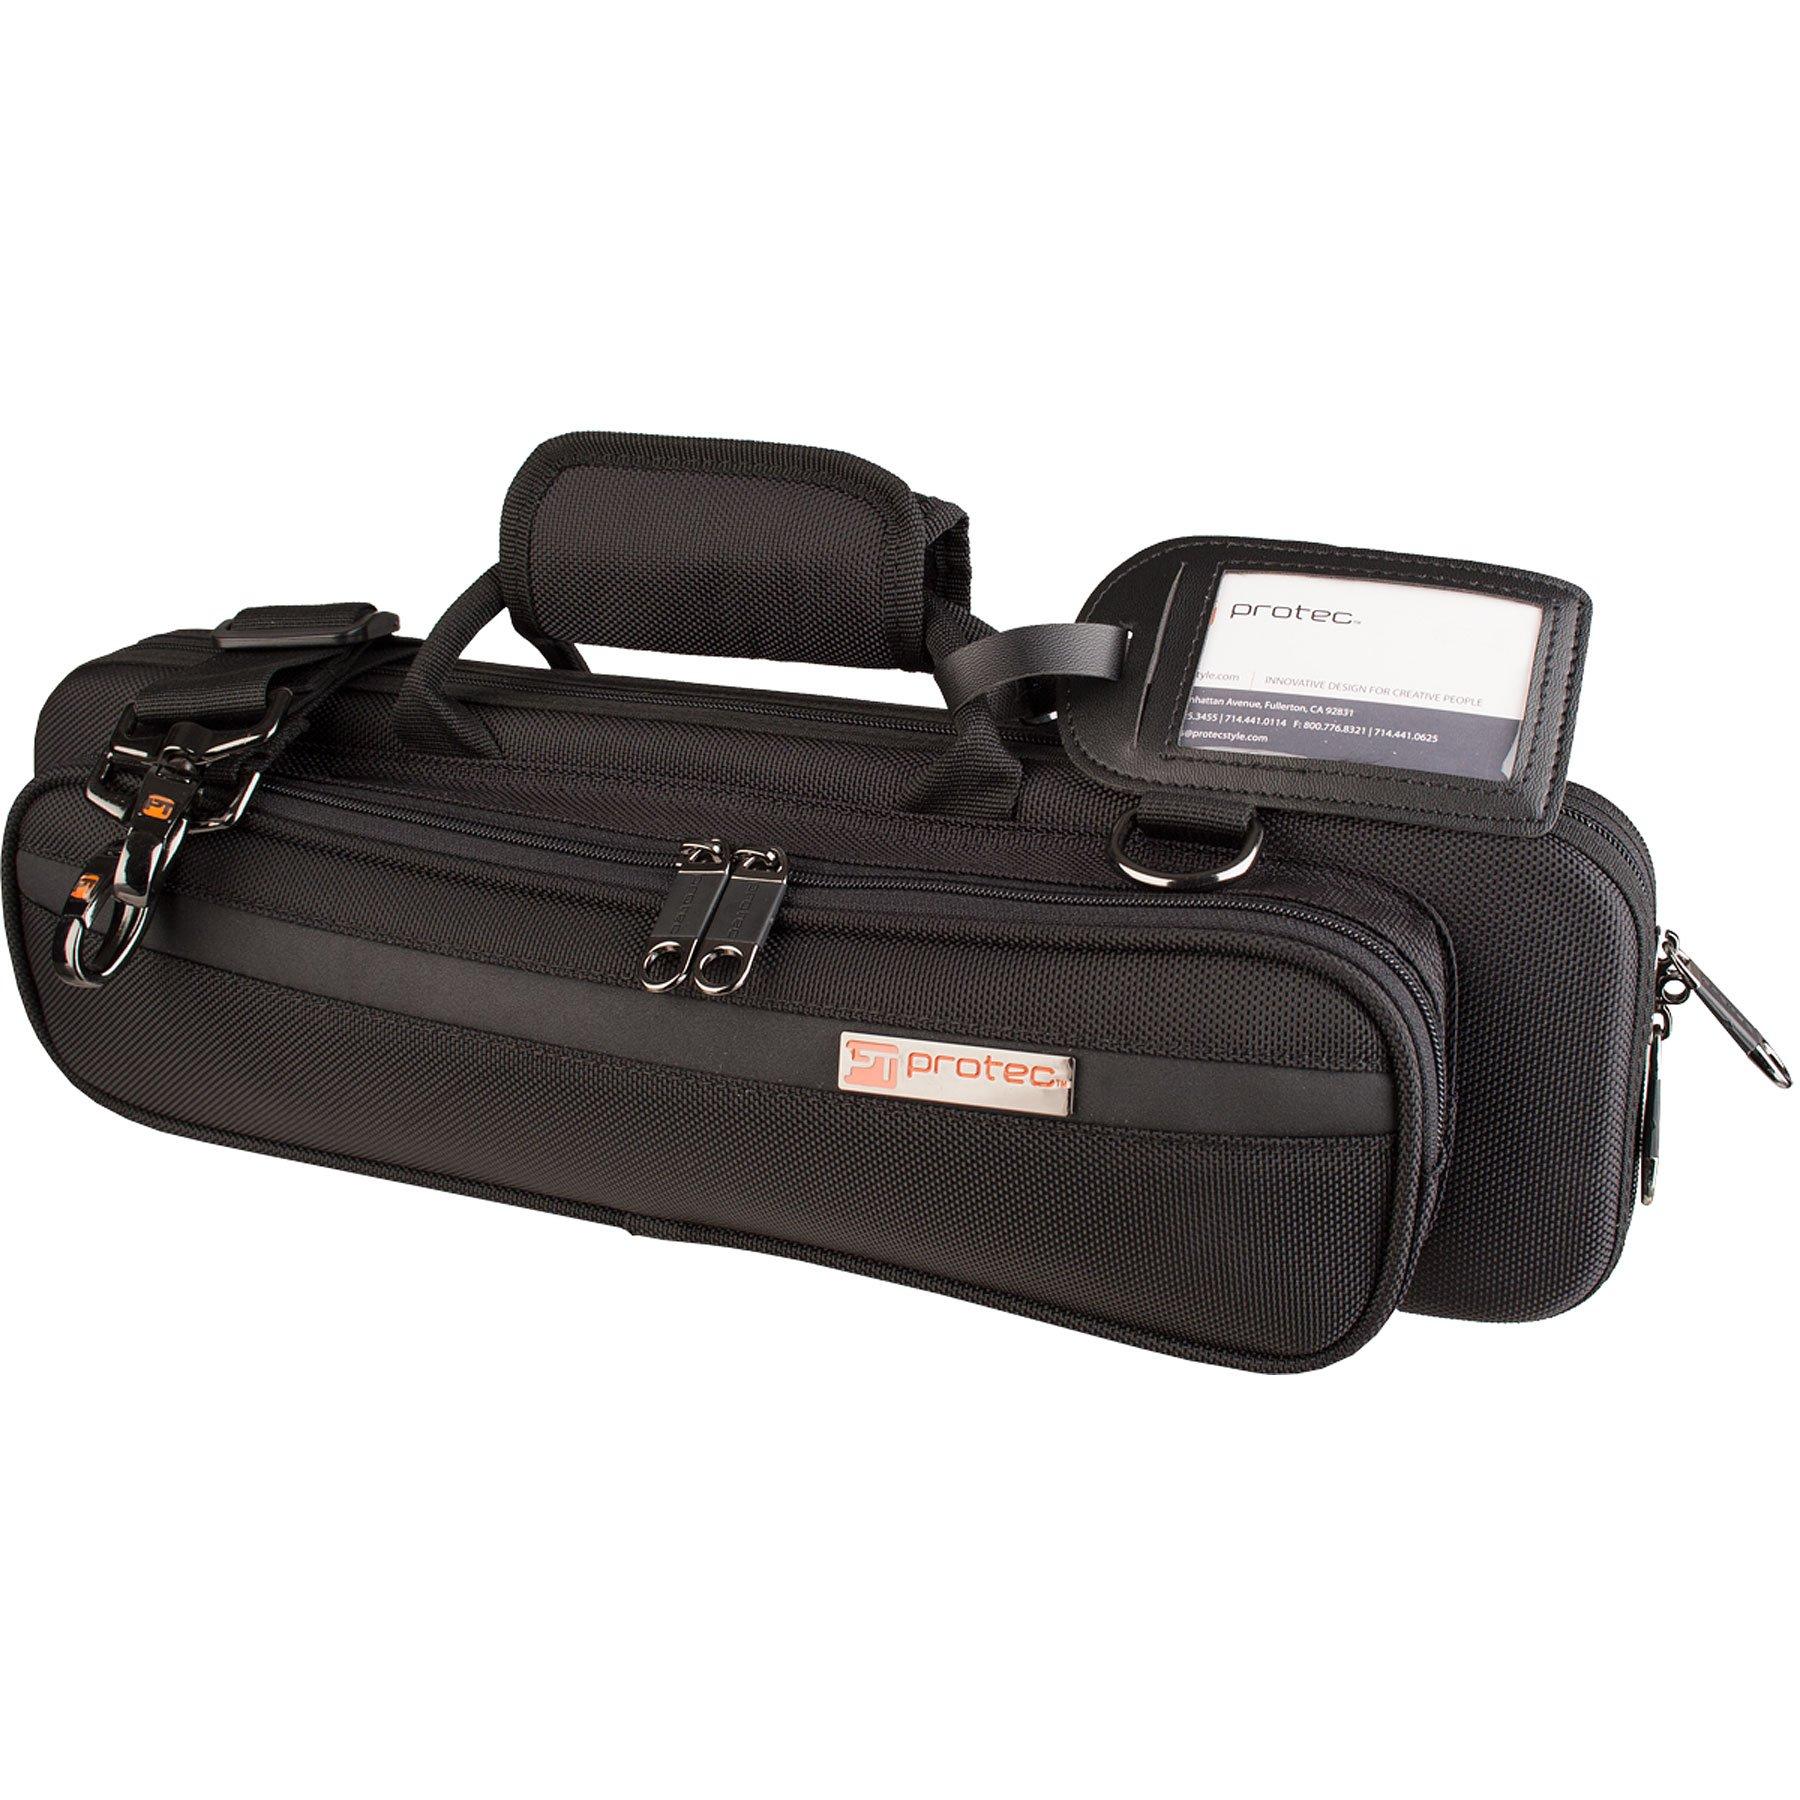 Protec PB308 - Funda para flauta travesera, color negro: Amazon.es: Instrumentos musicales